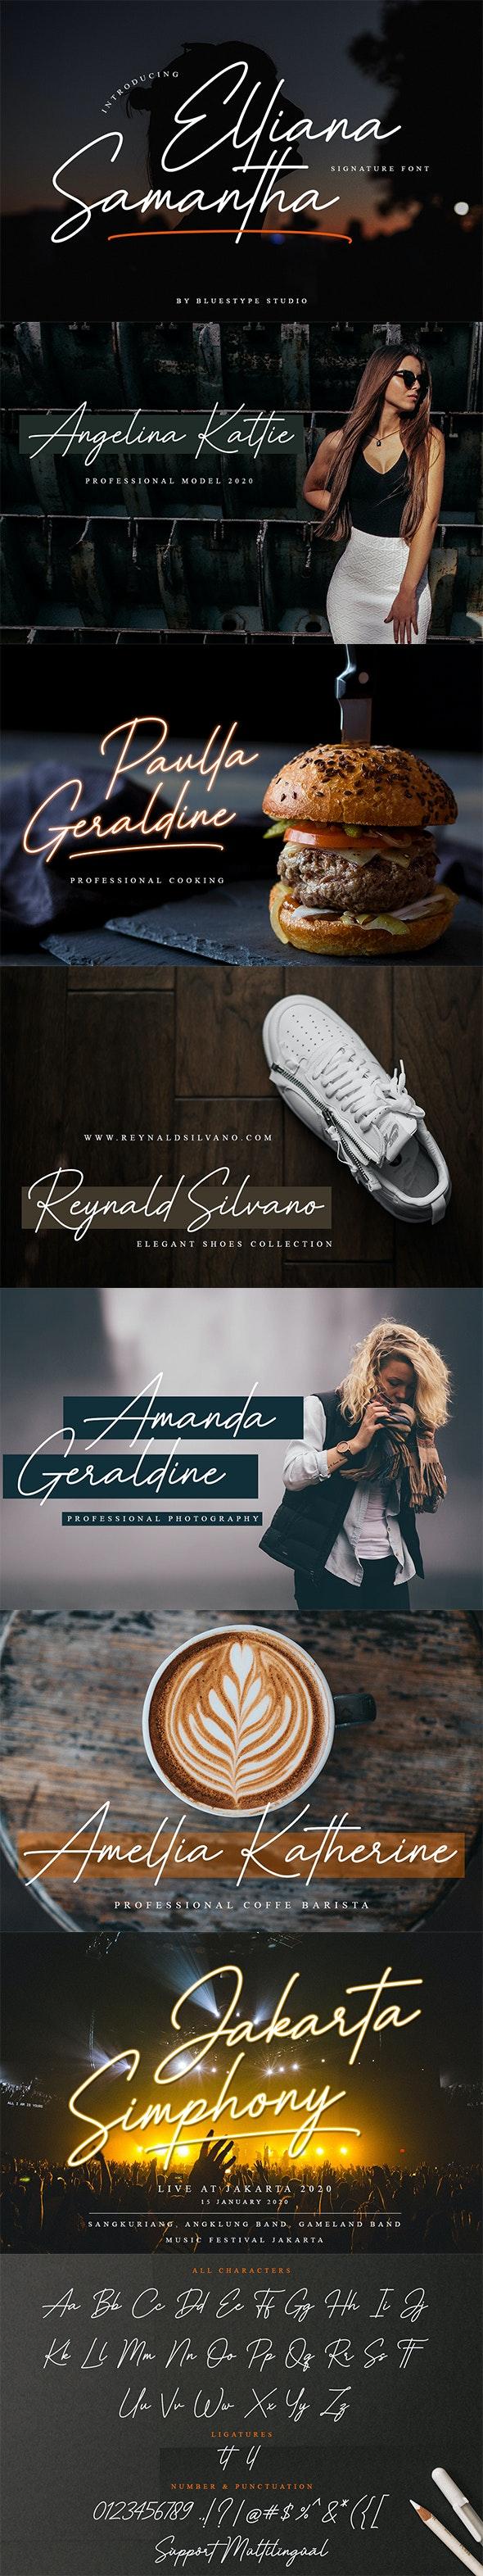 Elliana Samantha - Hand-writing Script